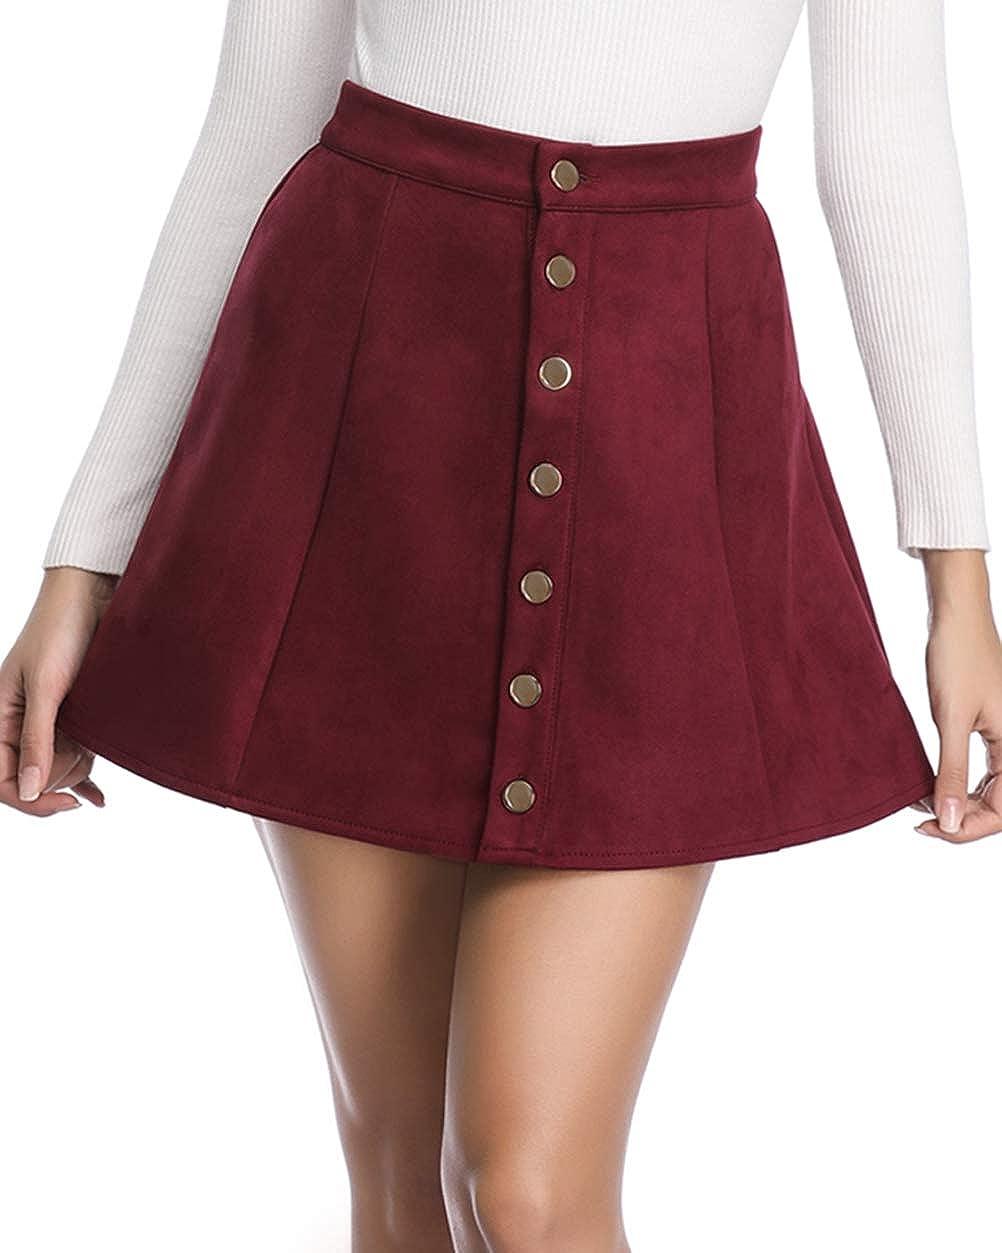 Fuinloth Women's Faux Suede Skirt Button Closure A-Line High Wasit Mini Short Skirt 2021